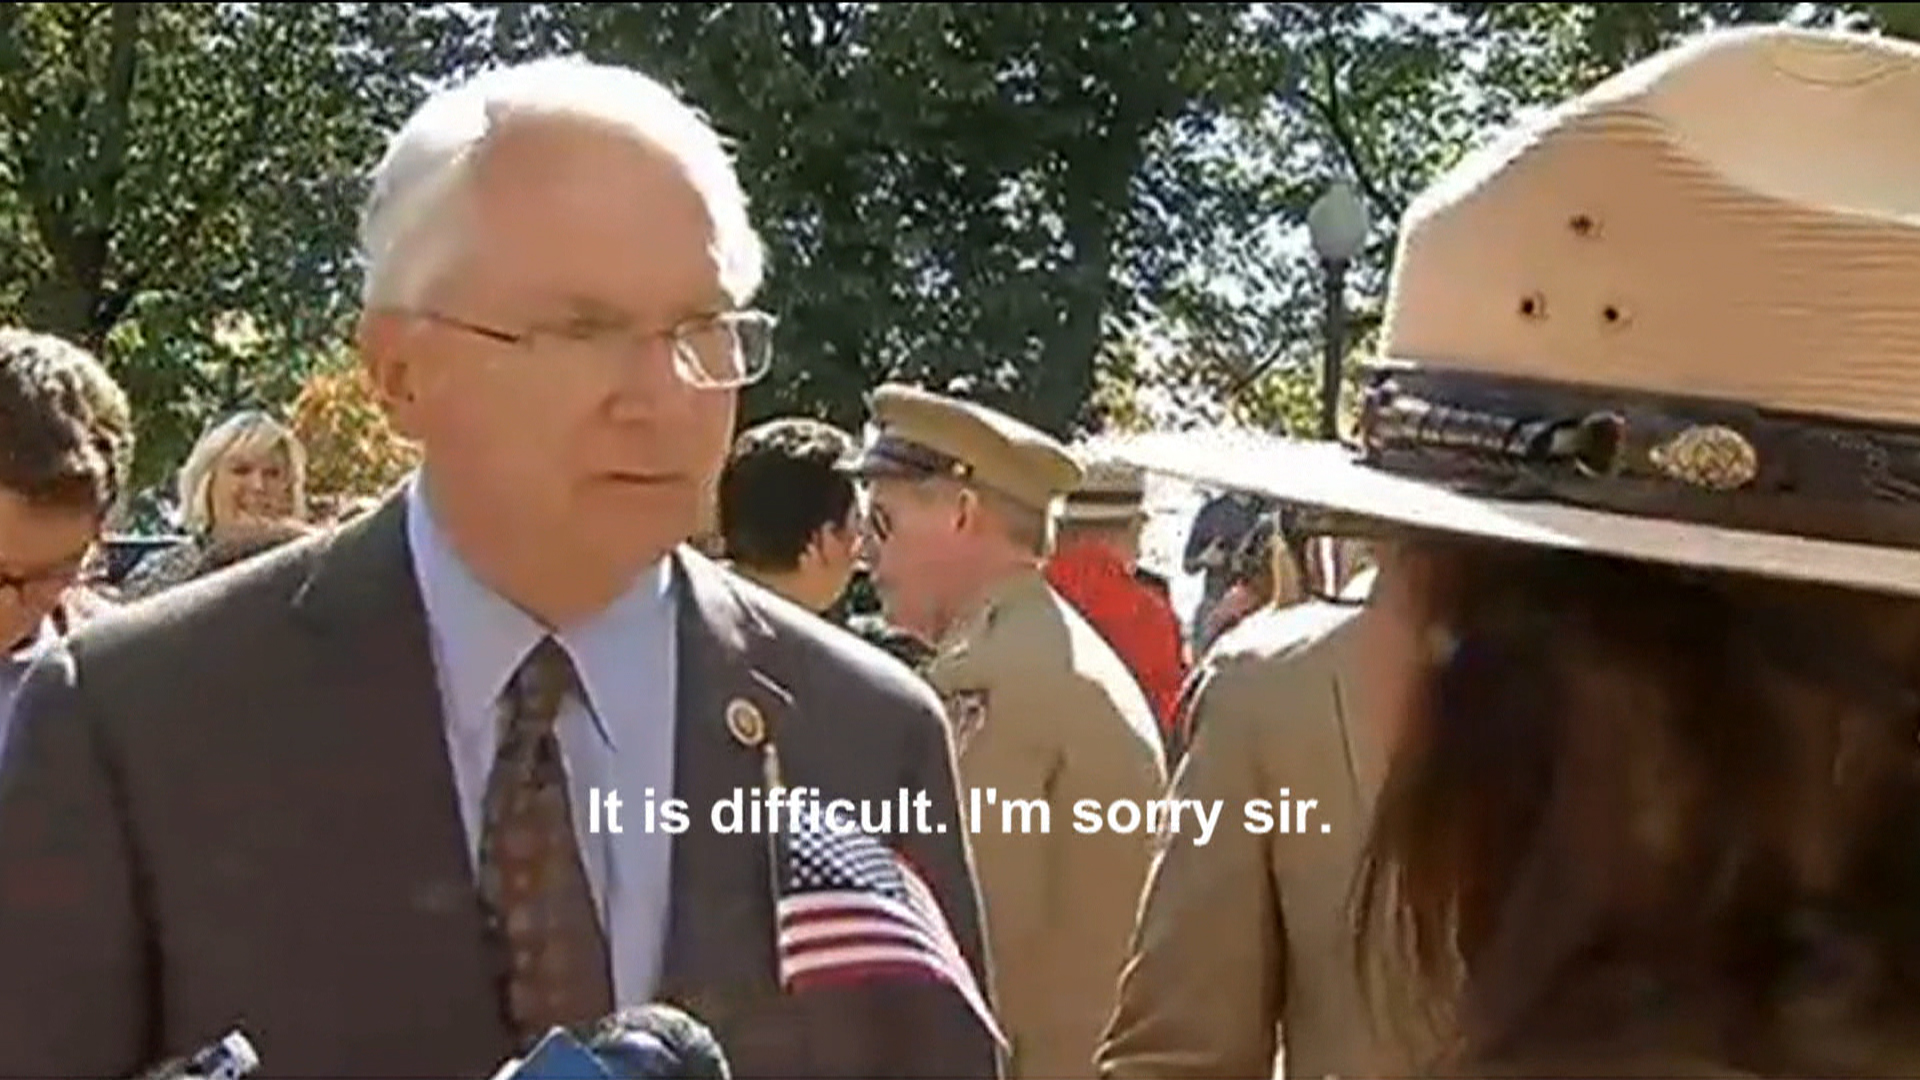 GOP congressman berates Park Service worker